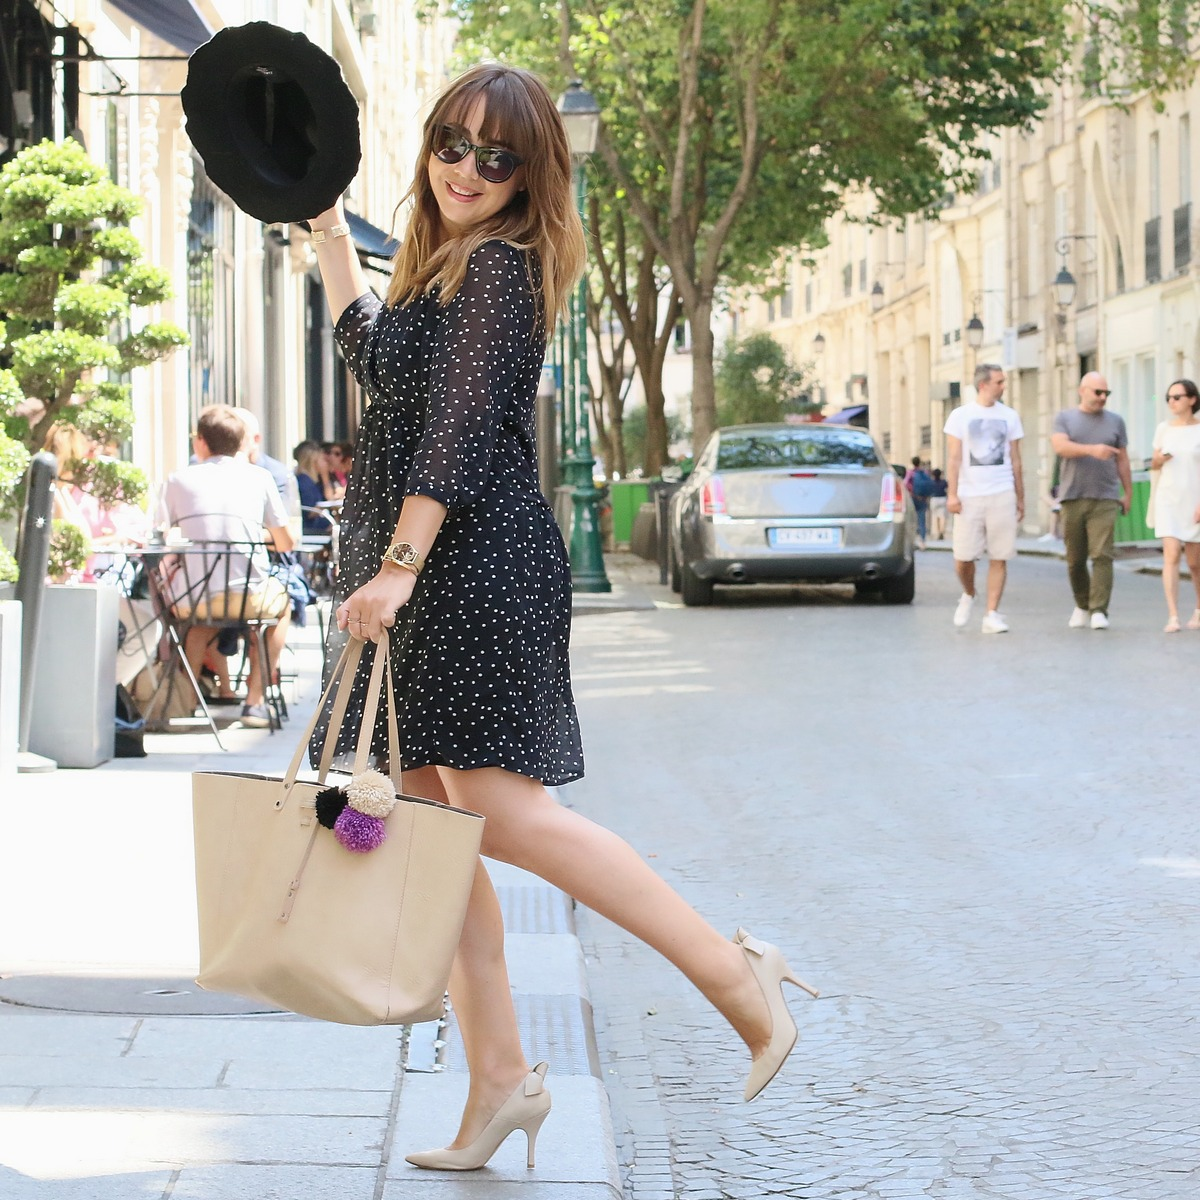 Blog mode femme Paris - Du style, Madame - Streetstyle - robe à pois - balsamik